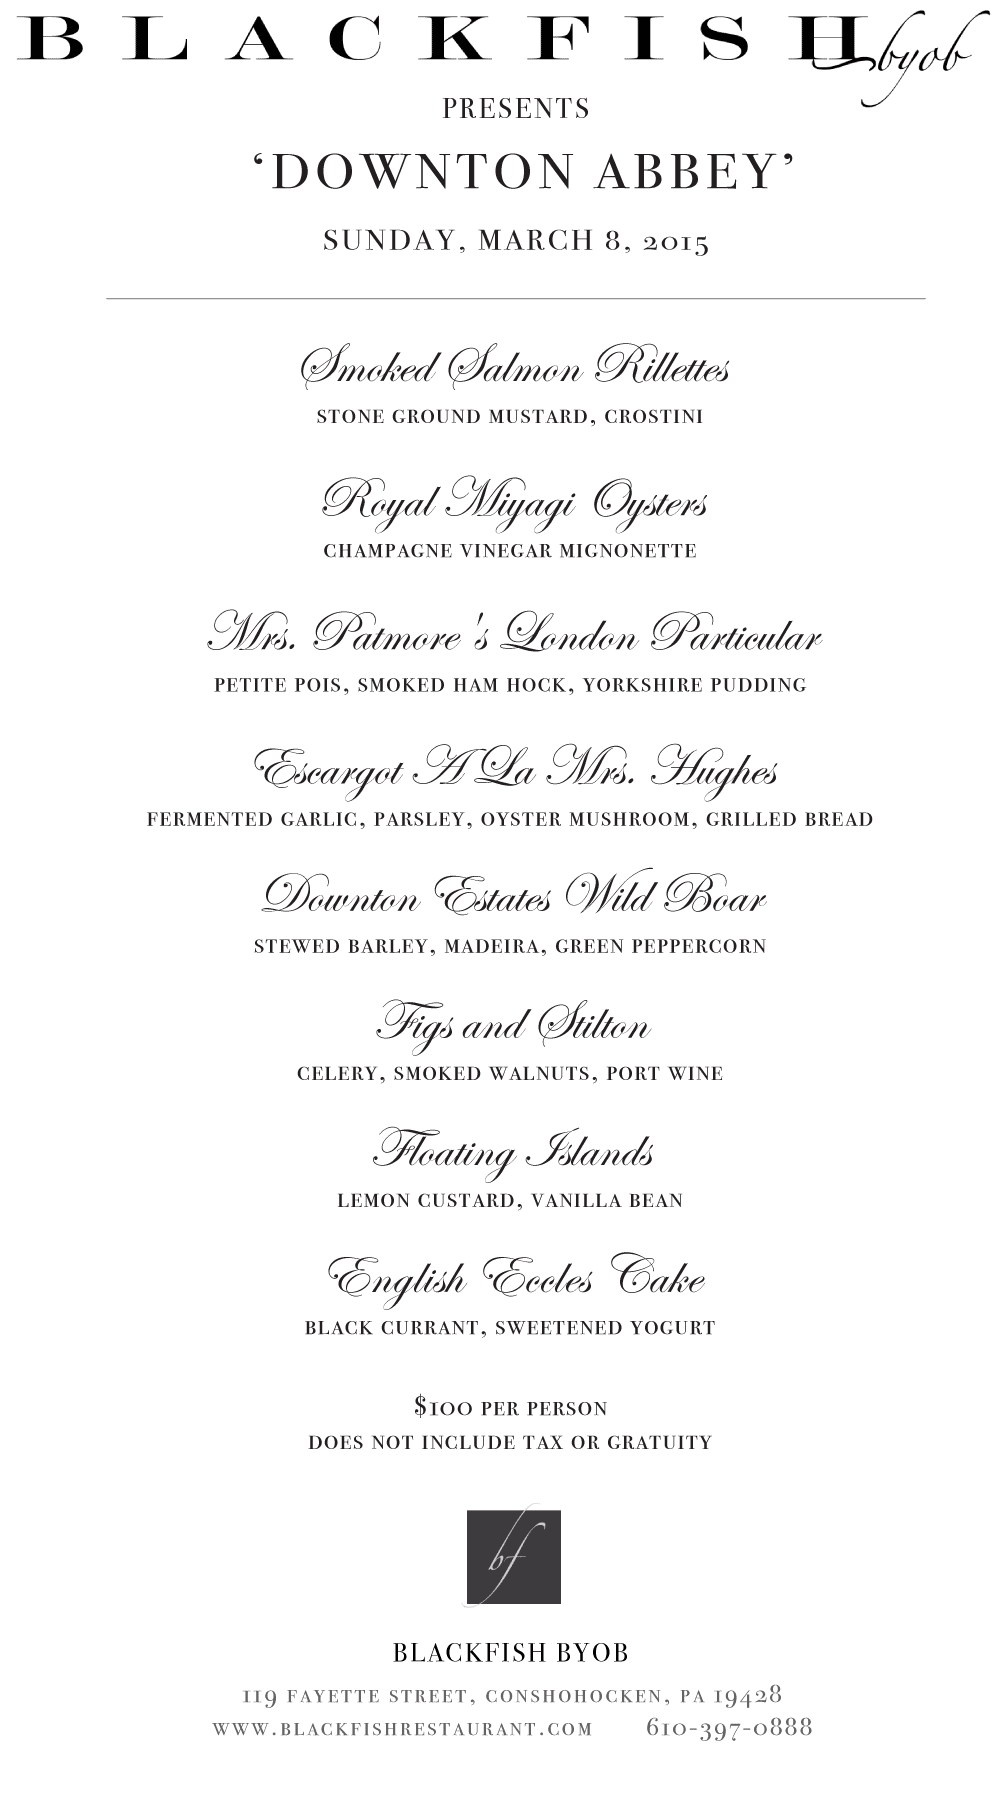 blackfish-Downton-Abbey-dinner-menu